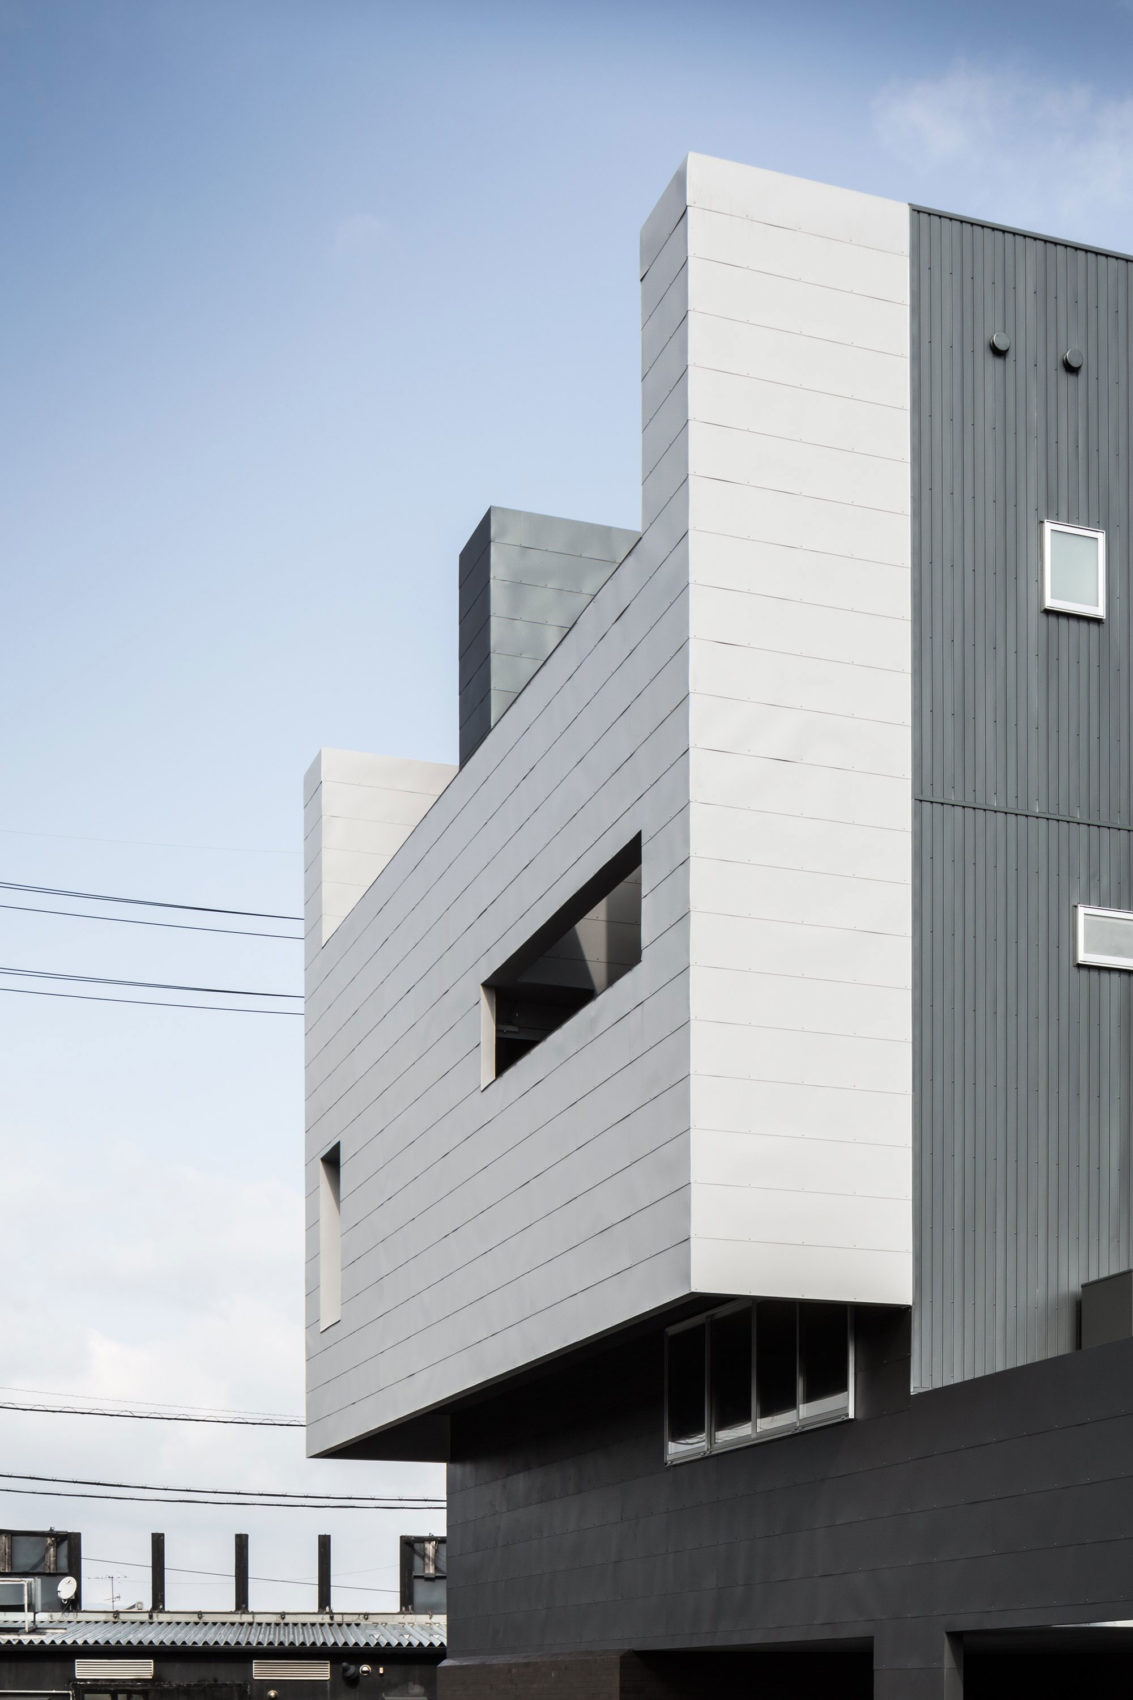 Complex by FORM | Kouichi Kimura Architects (3)